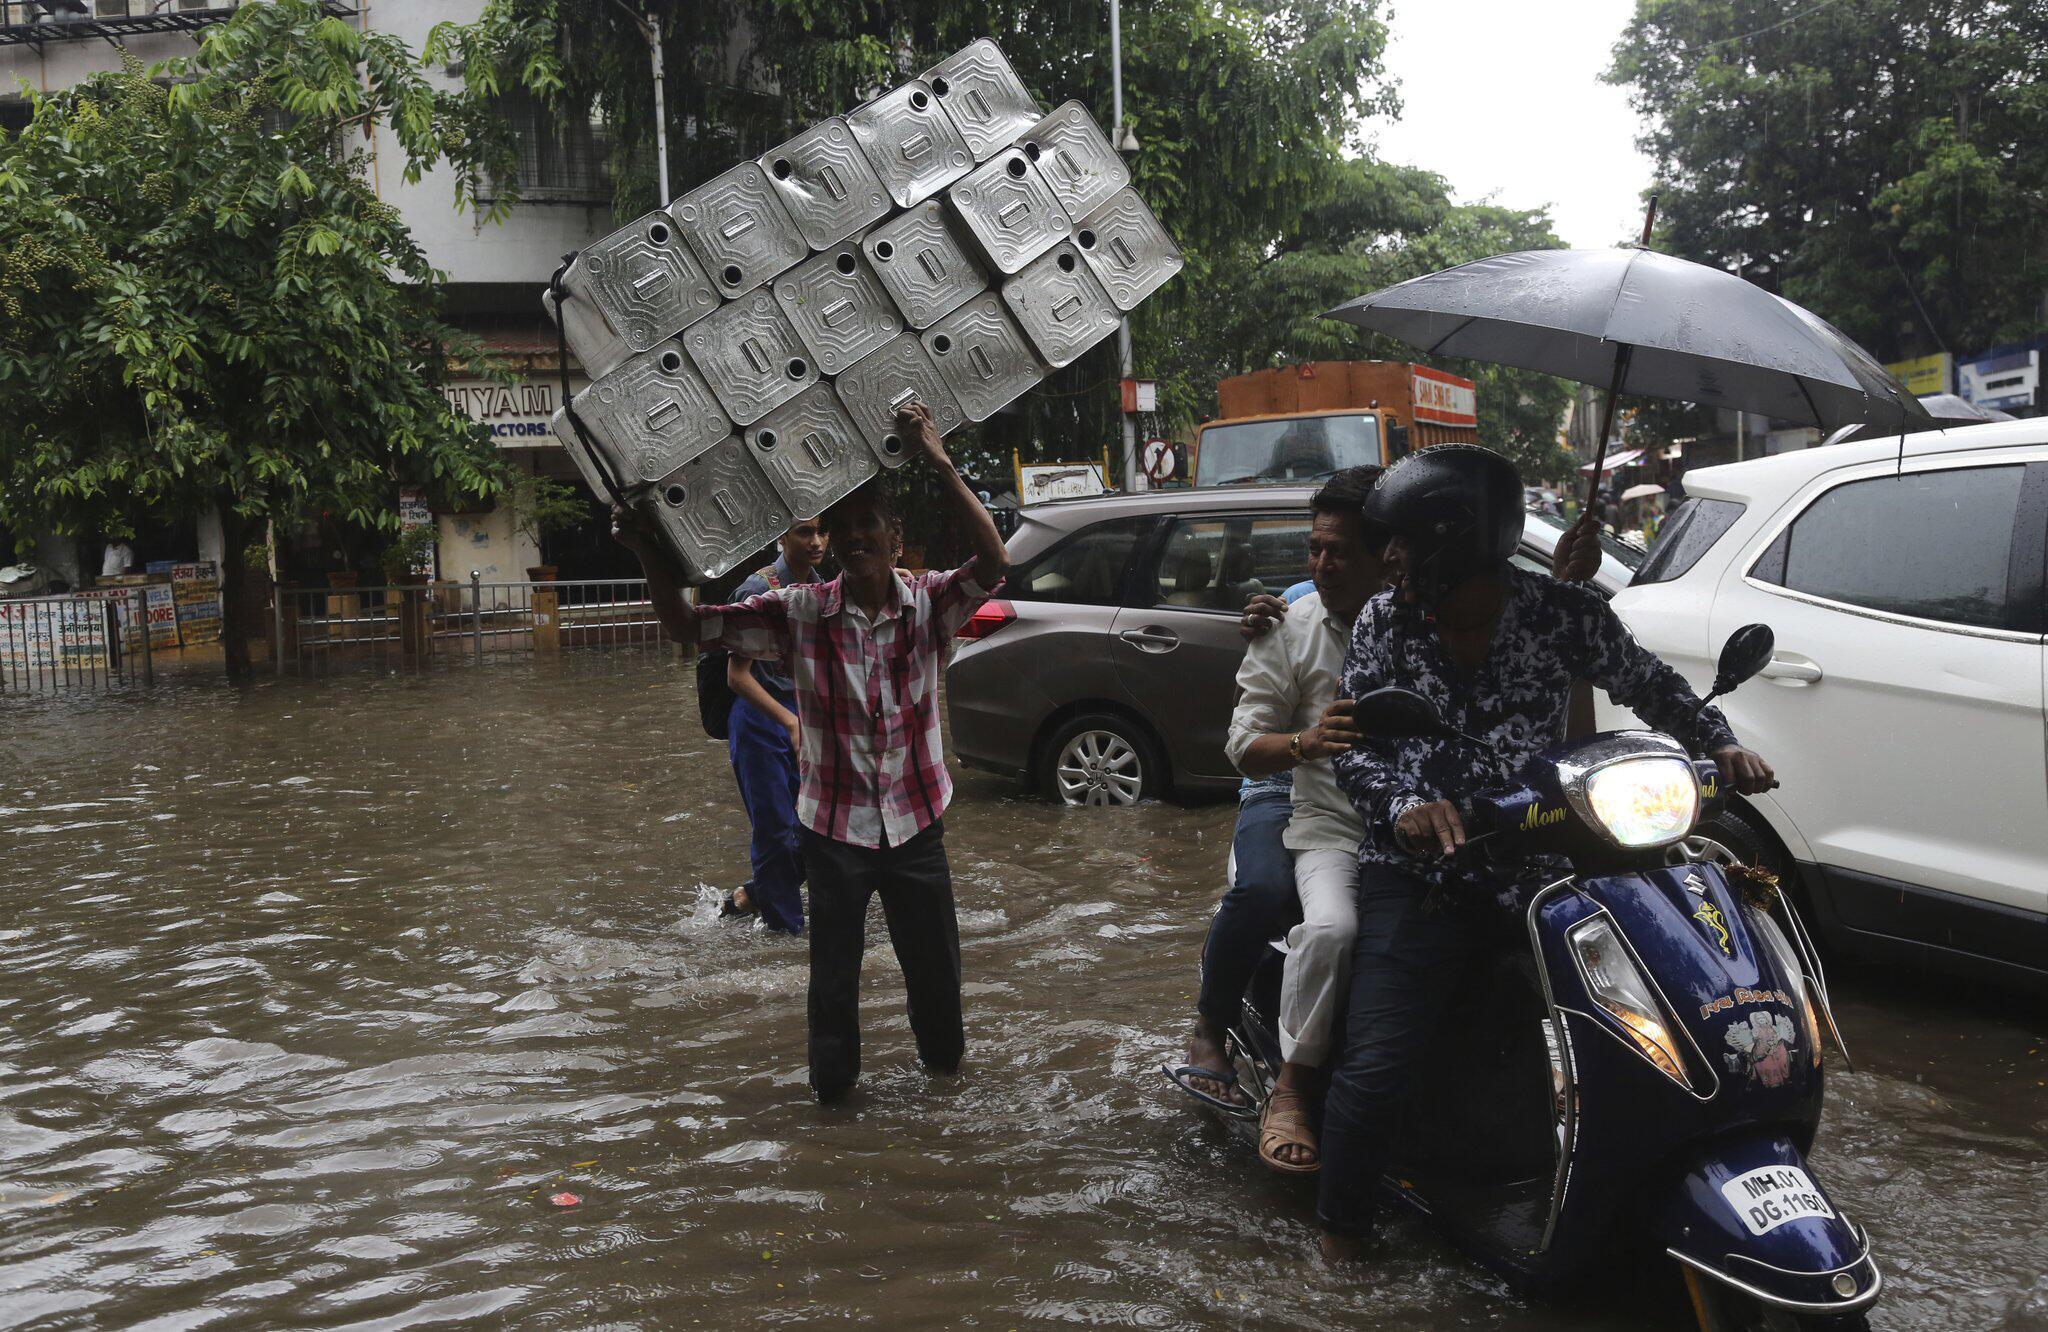 Bild zu Wetter, Indien, Monsun, Monsunregen, Wassermassen, Mumbai